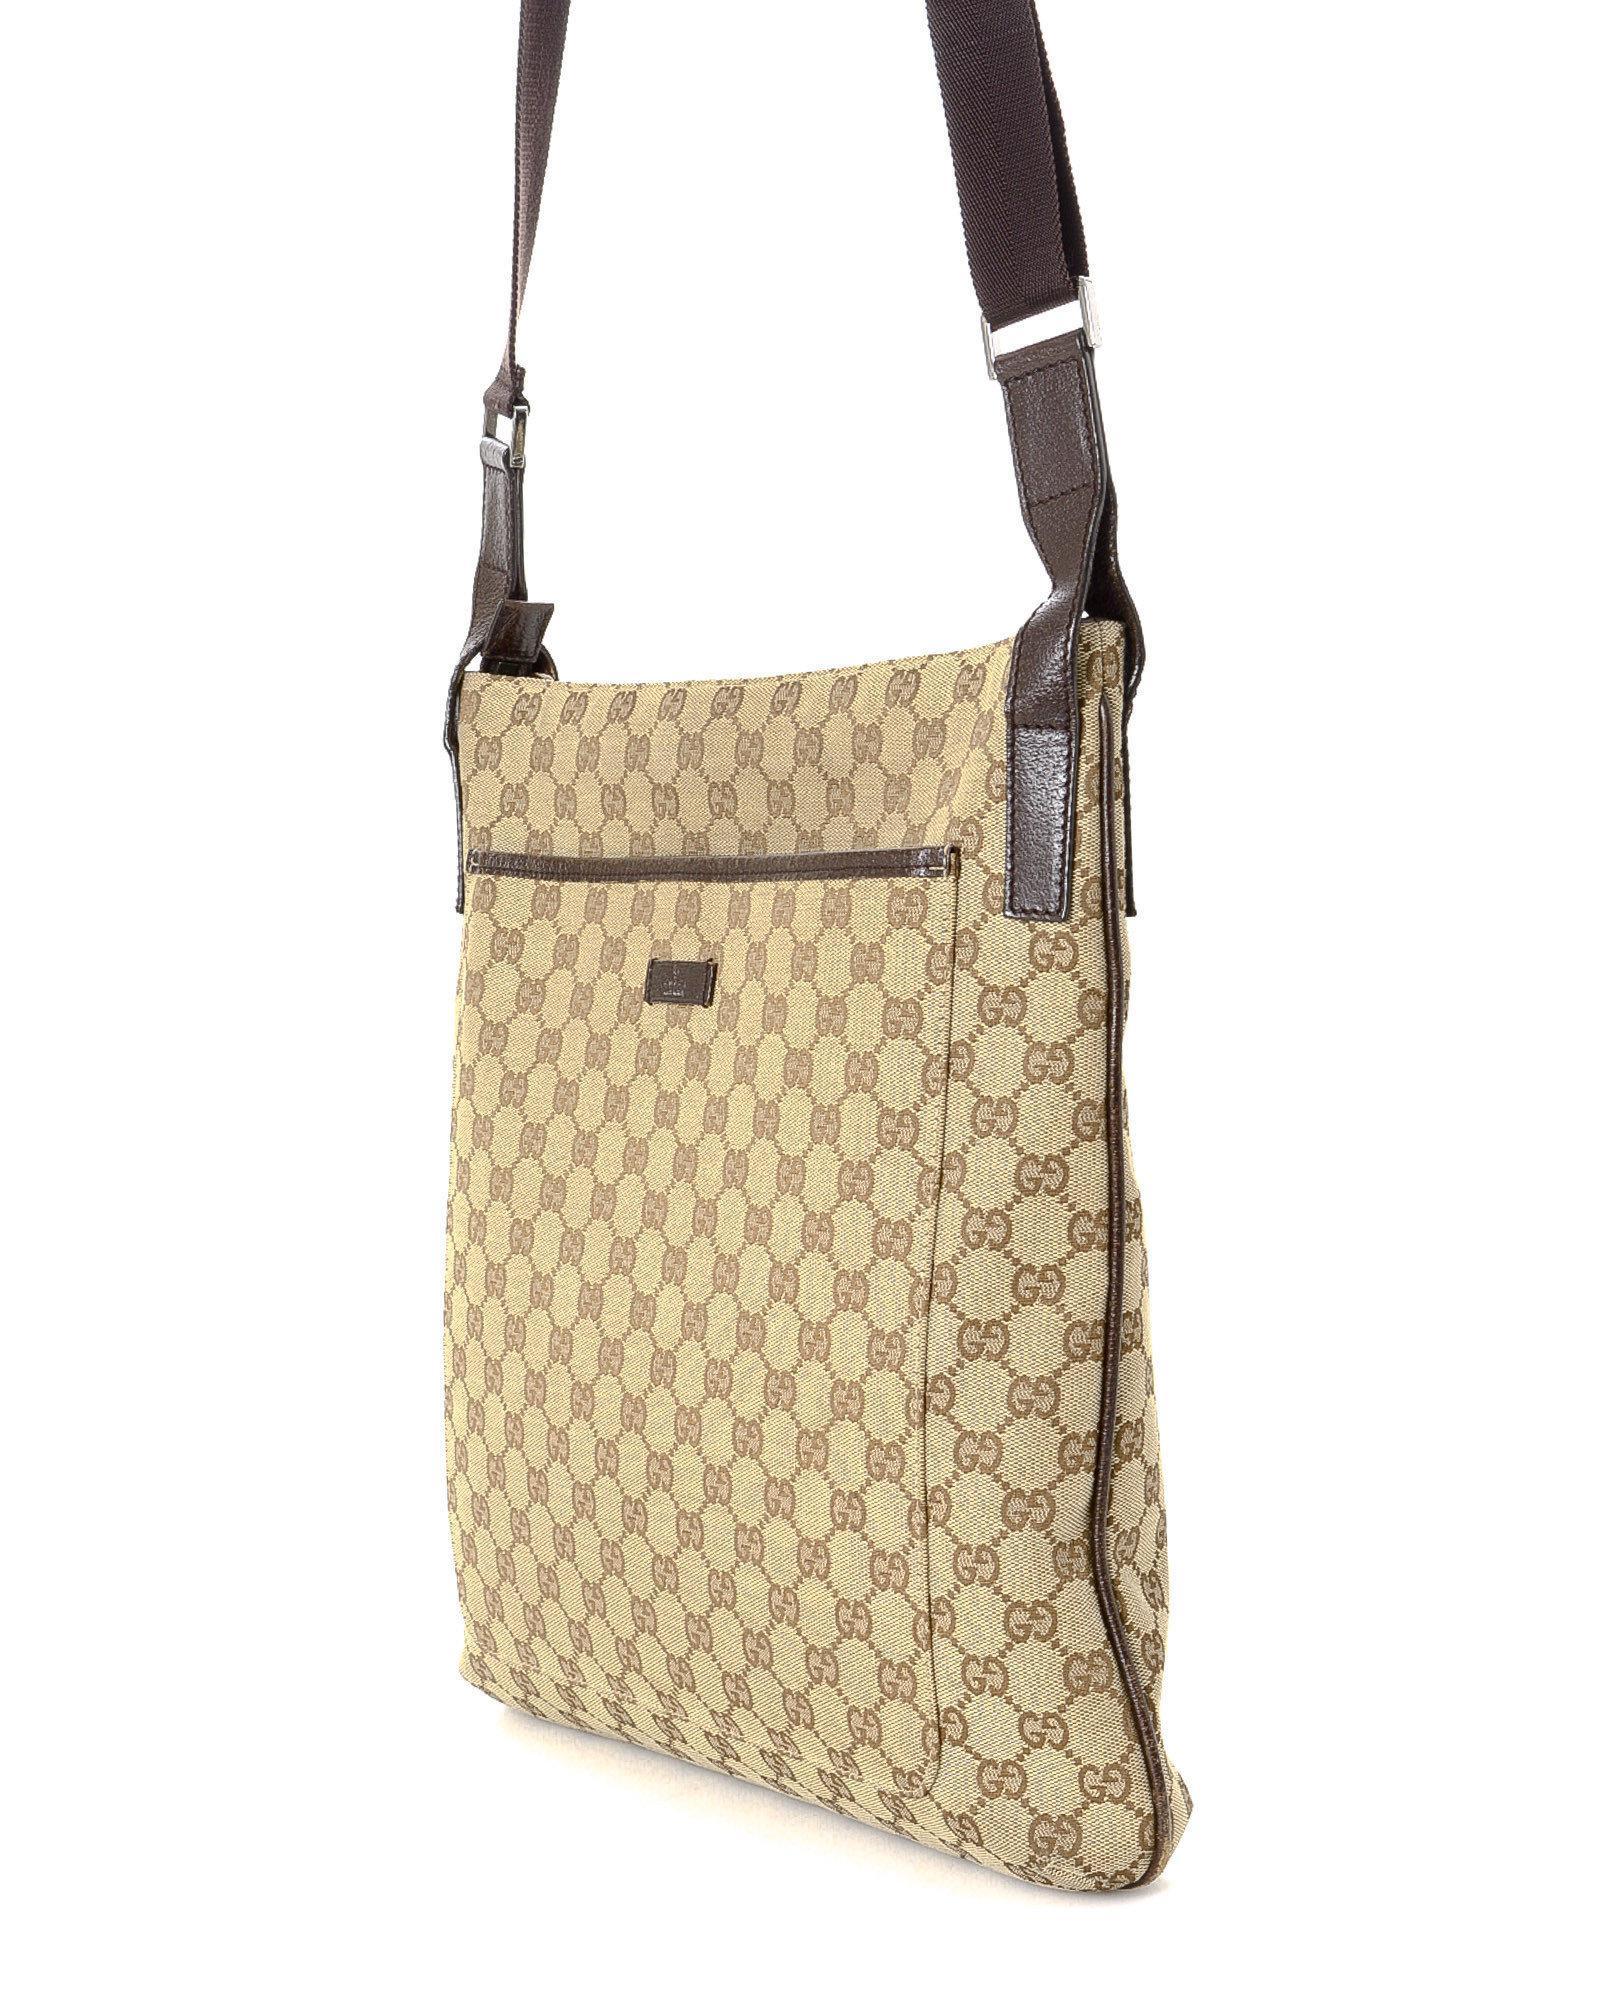 89d8ccb83e Lyst - Gucci Crossbody Bag - Vintage in Natural